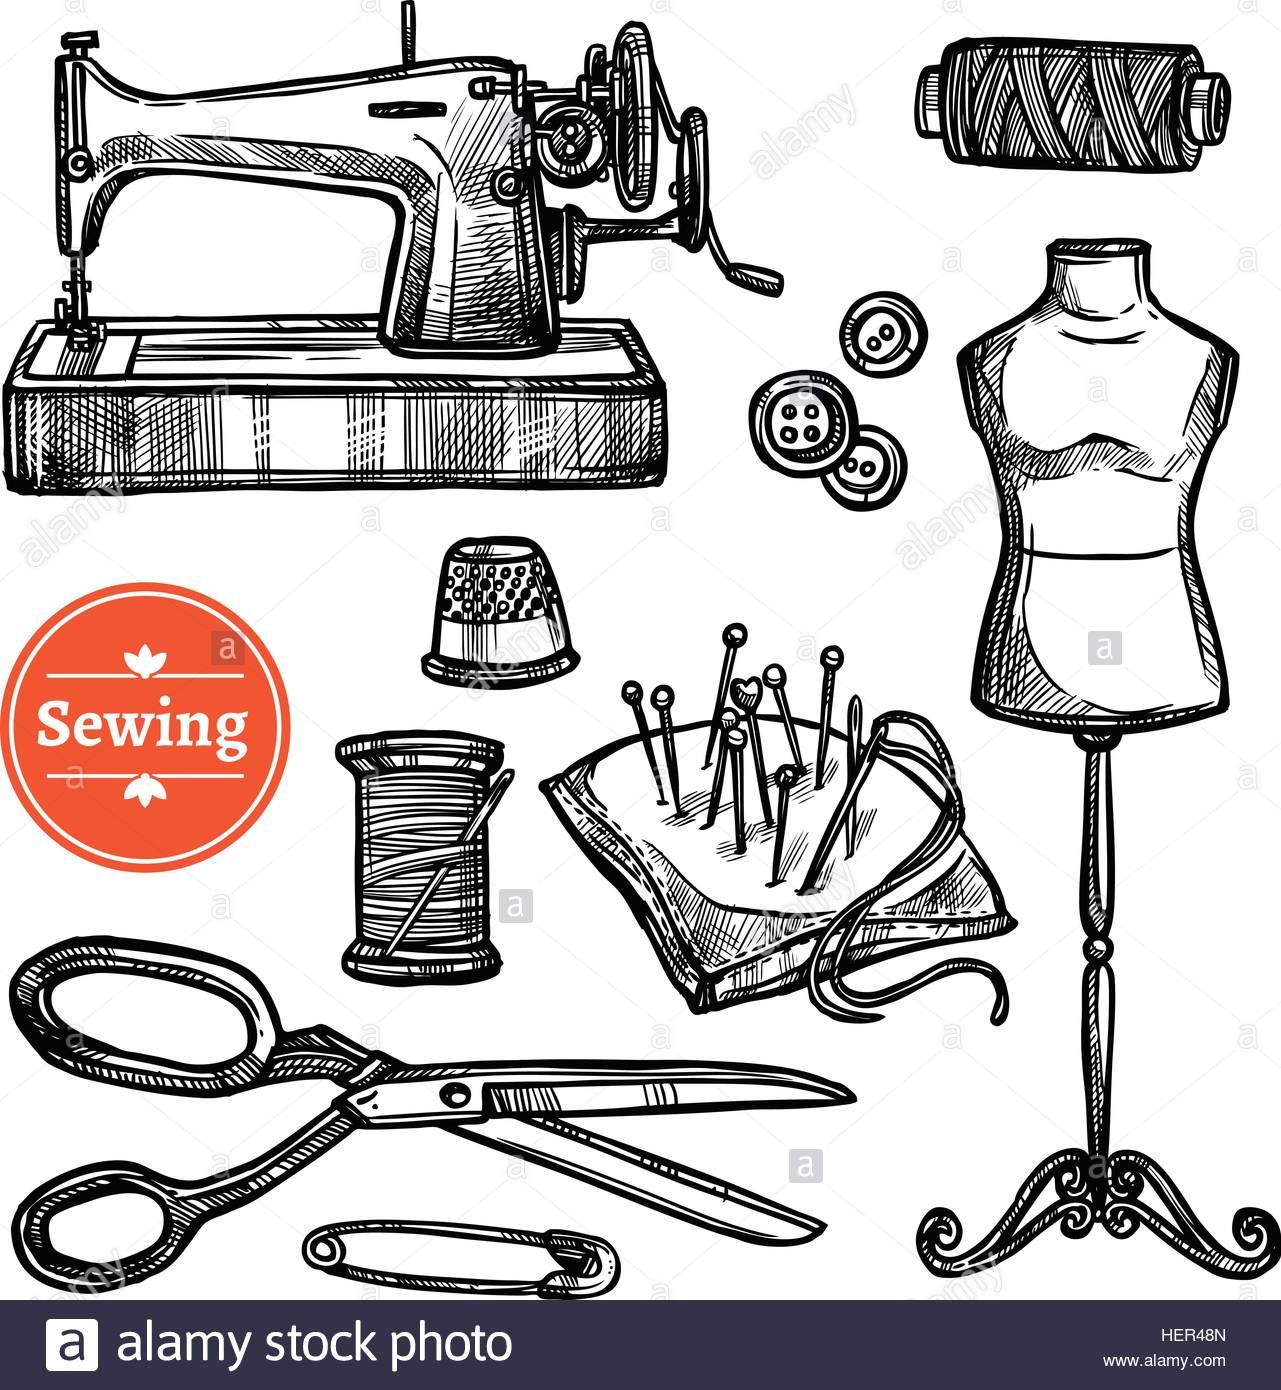 1281x1390 Hand Drawn Sketch Sewing Set. Hand Drawn Sketch Sewing Set